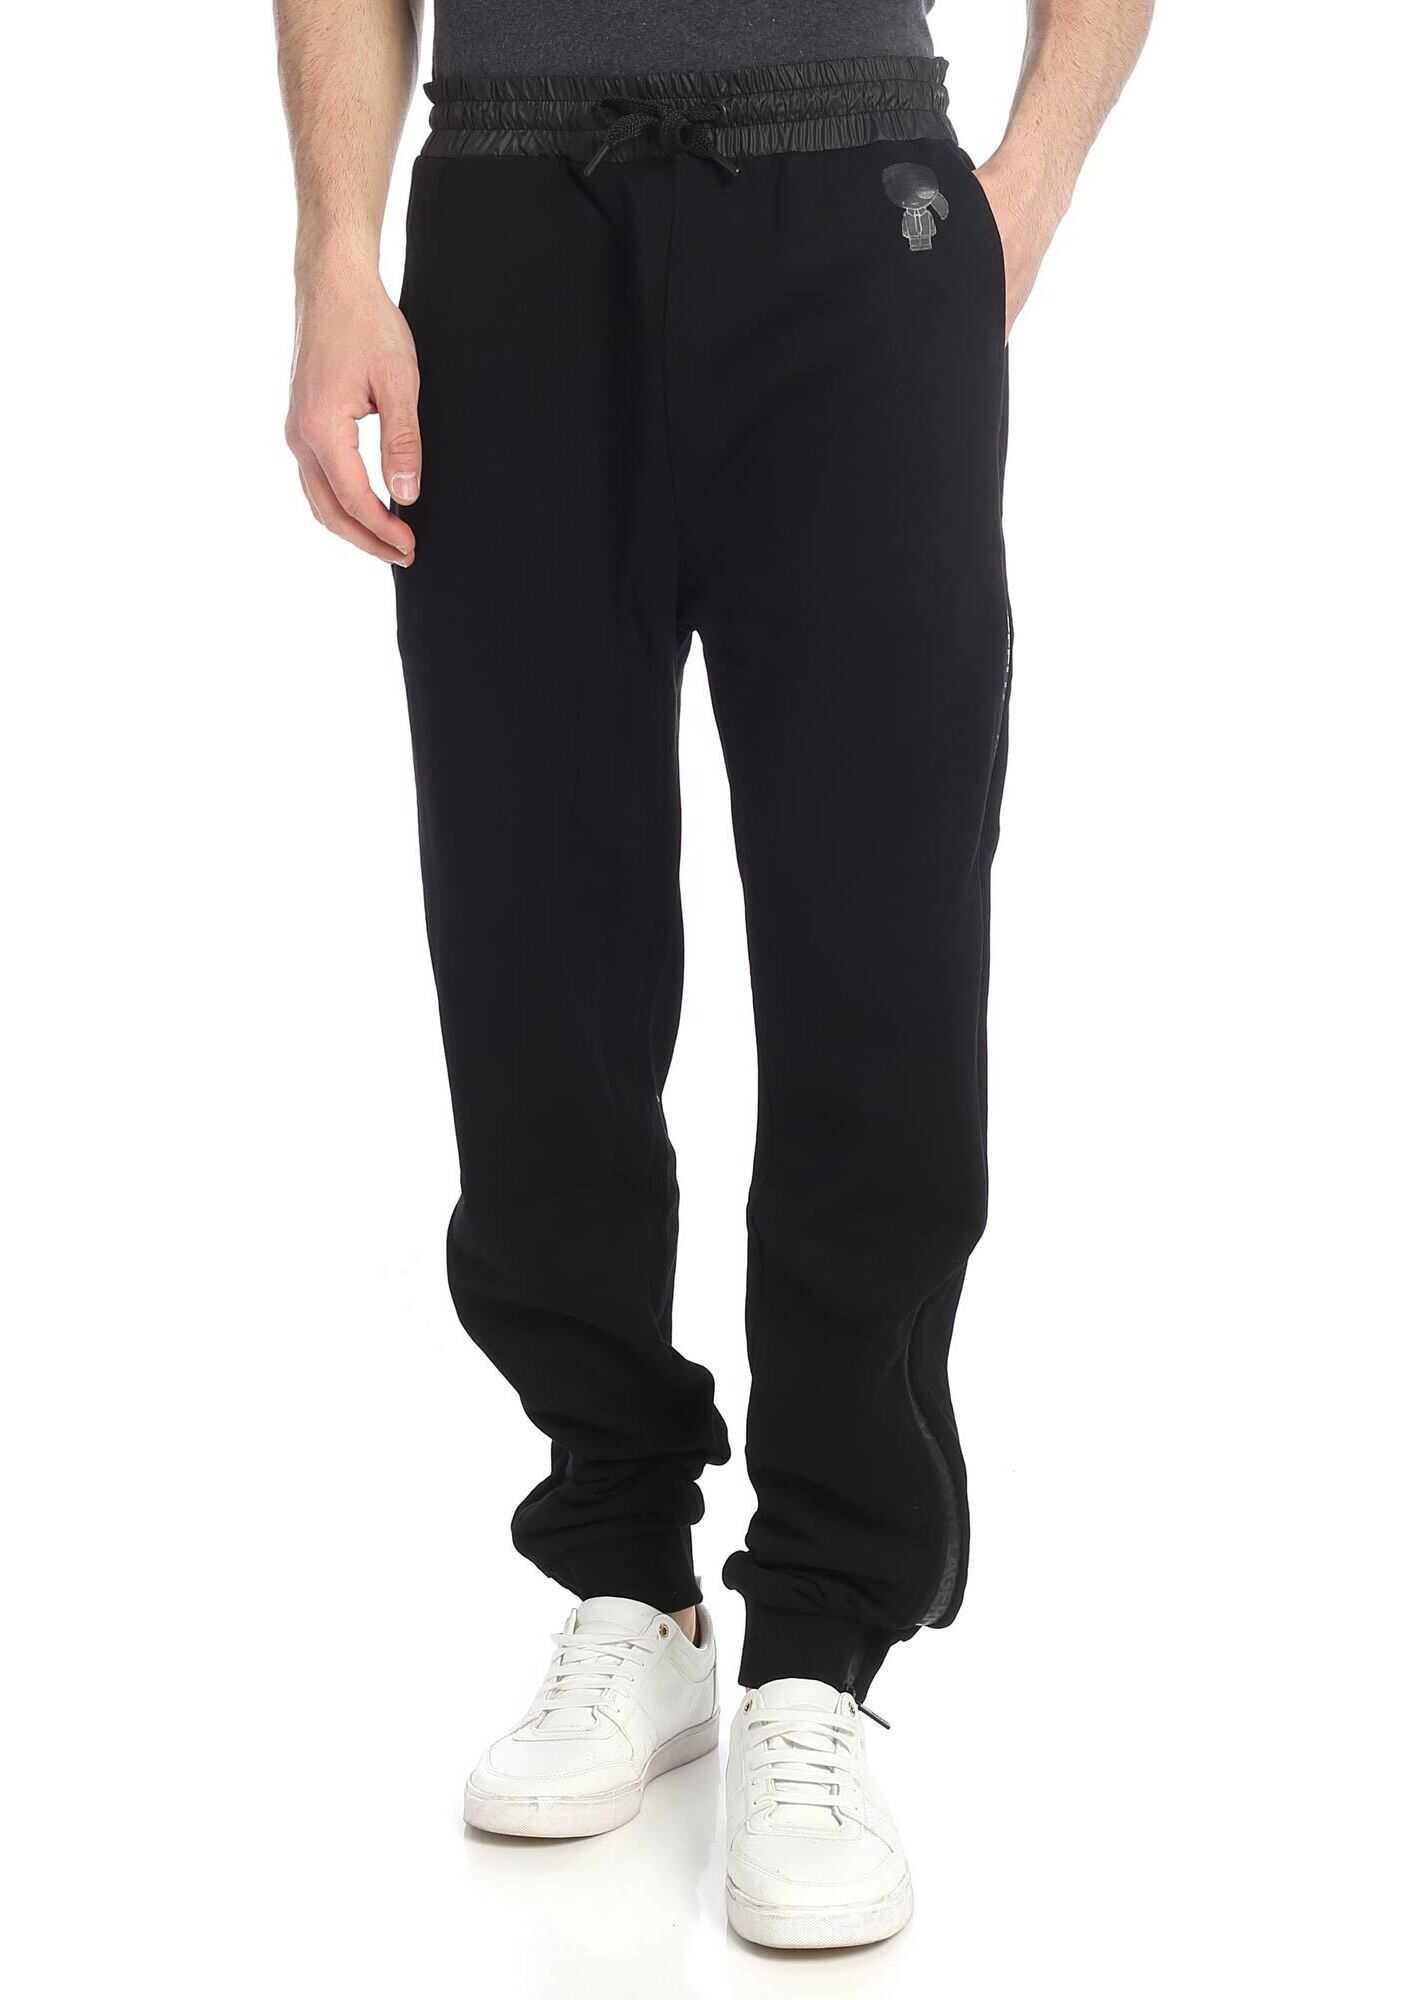 Karl Lagerfeld K Ikonik Black Sweat Pants Black imagine